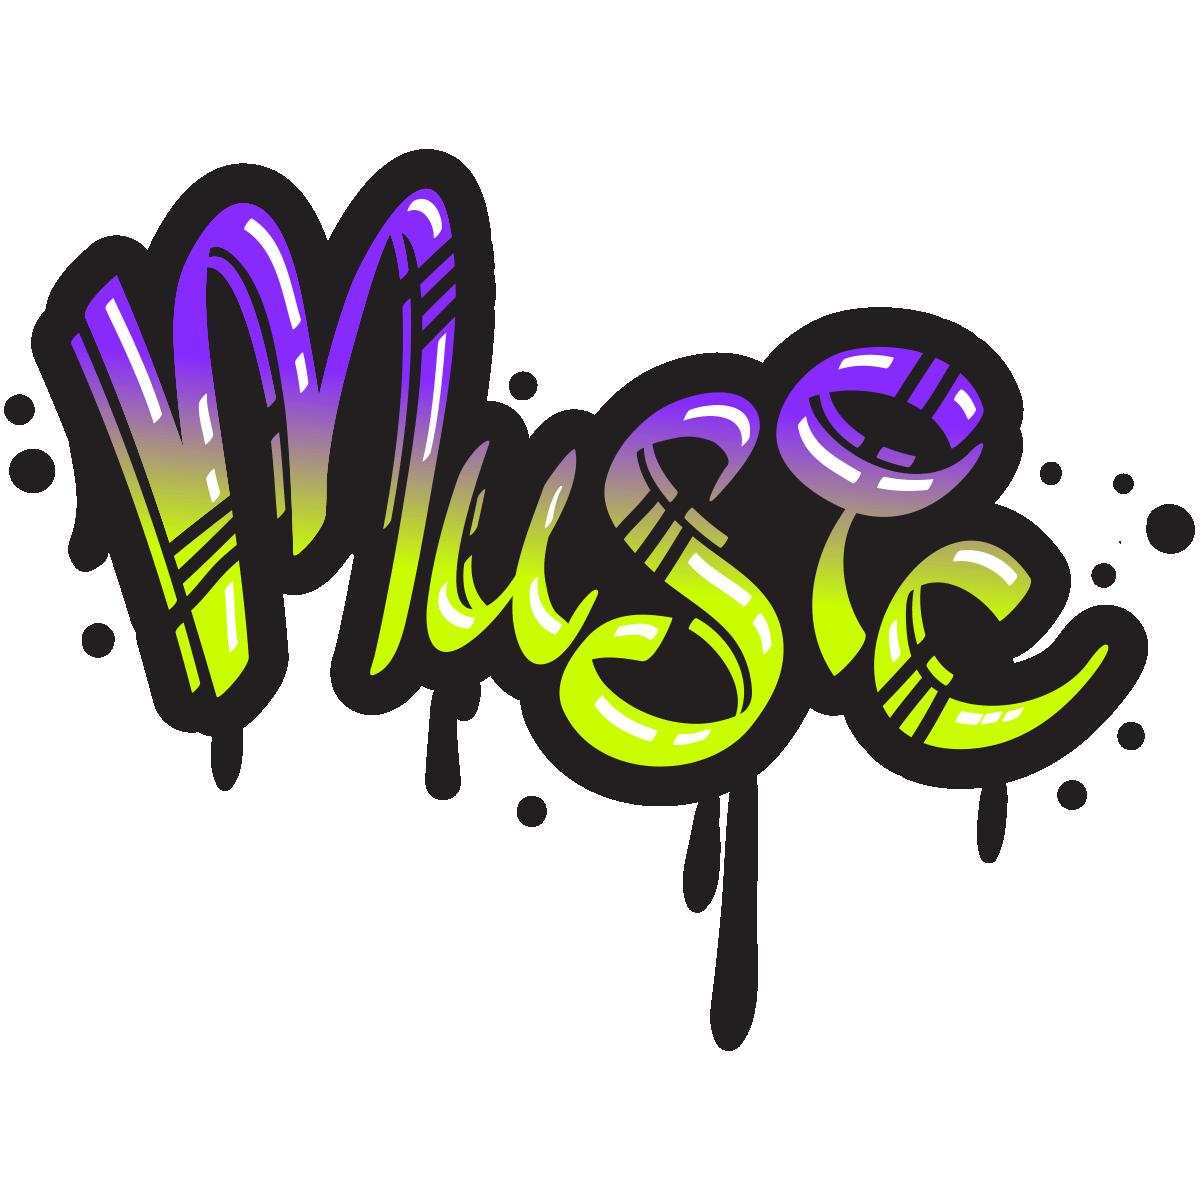 sticker graffiti music stickers art et design graffitis brozart ambiance sticker music note clipart png music note clipart border